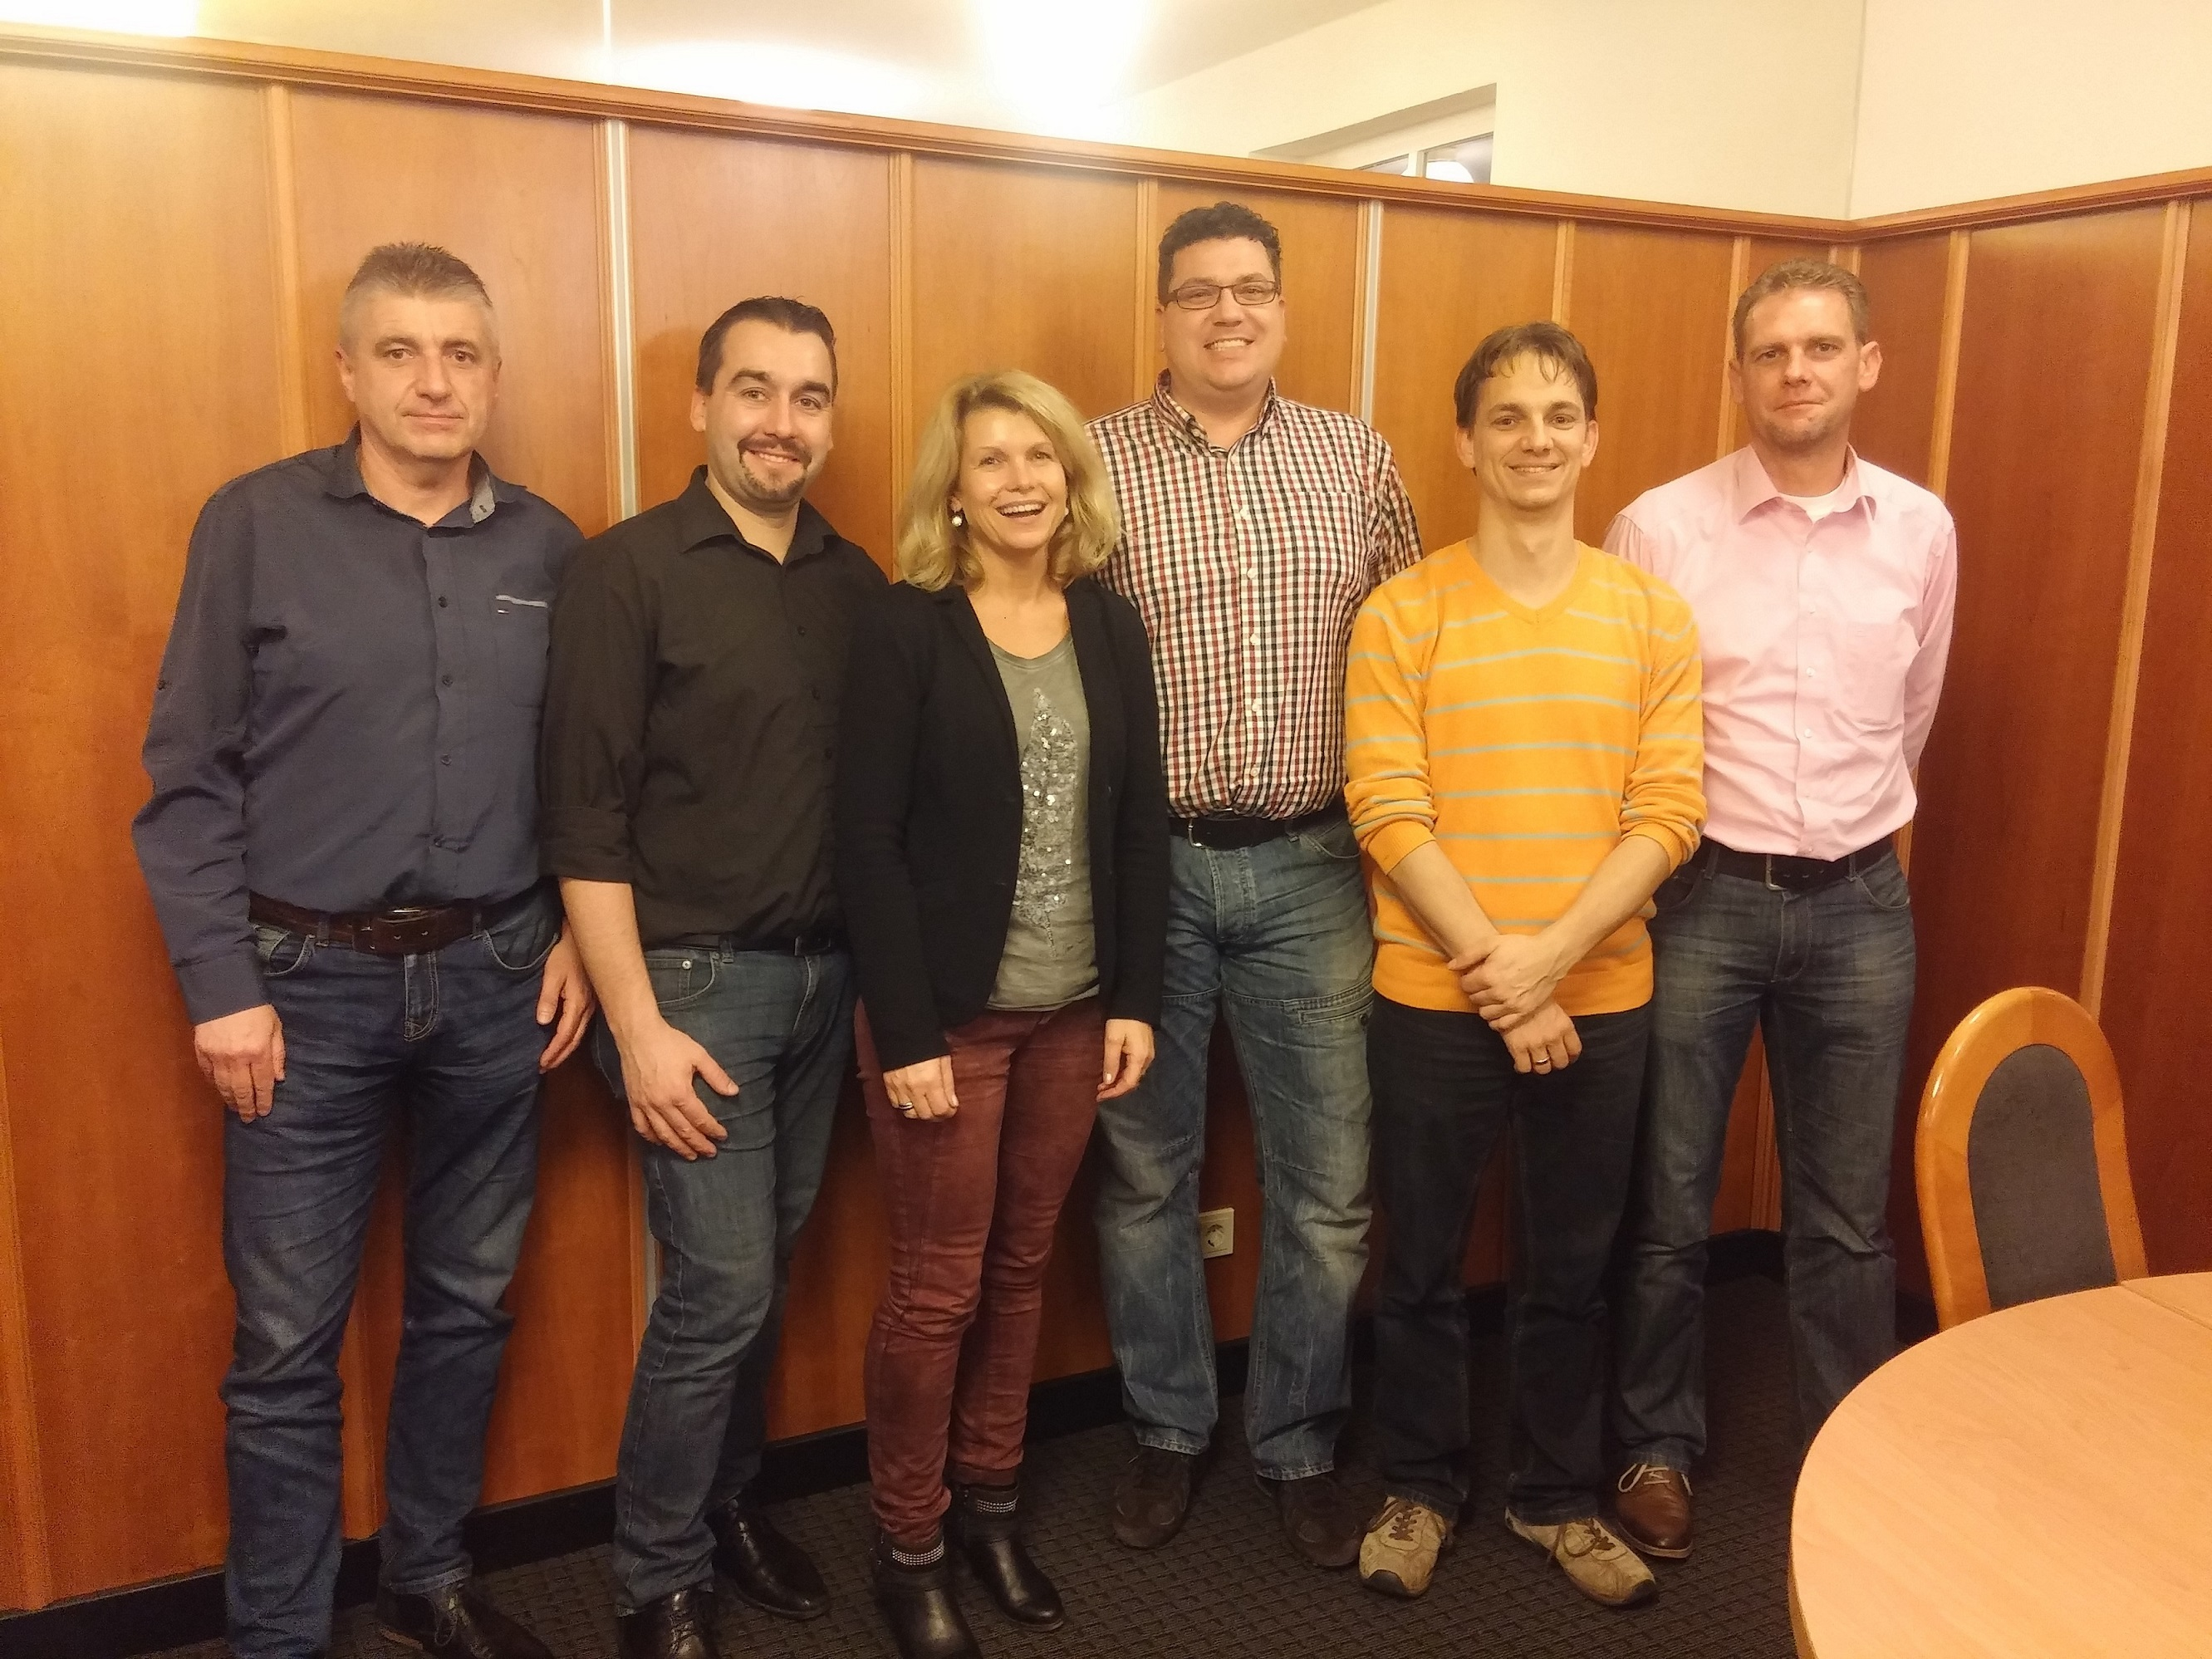 Der neu gewählte Vorstand: (v. l. n.r.: Dieter Vey, Daniel Trapp, Angelika Hildenbrand, Matthias Pappert, Christian Schön, Marco Fladung. Es fehlt: Nikolai Hildenbrand.